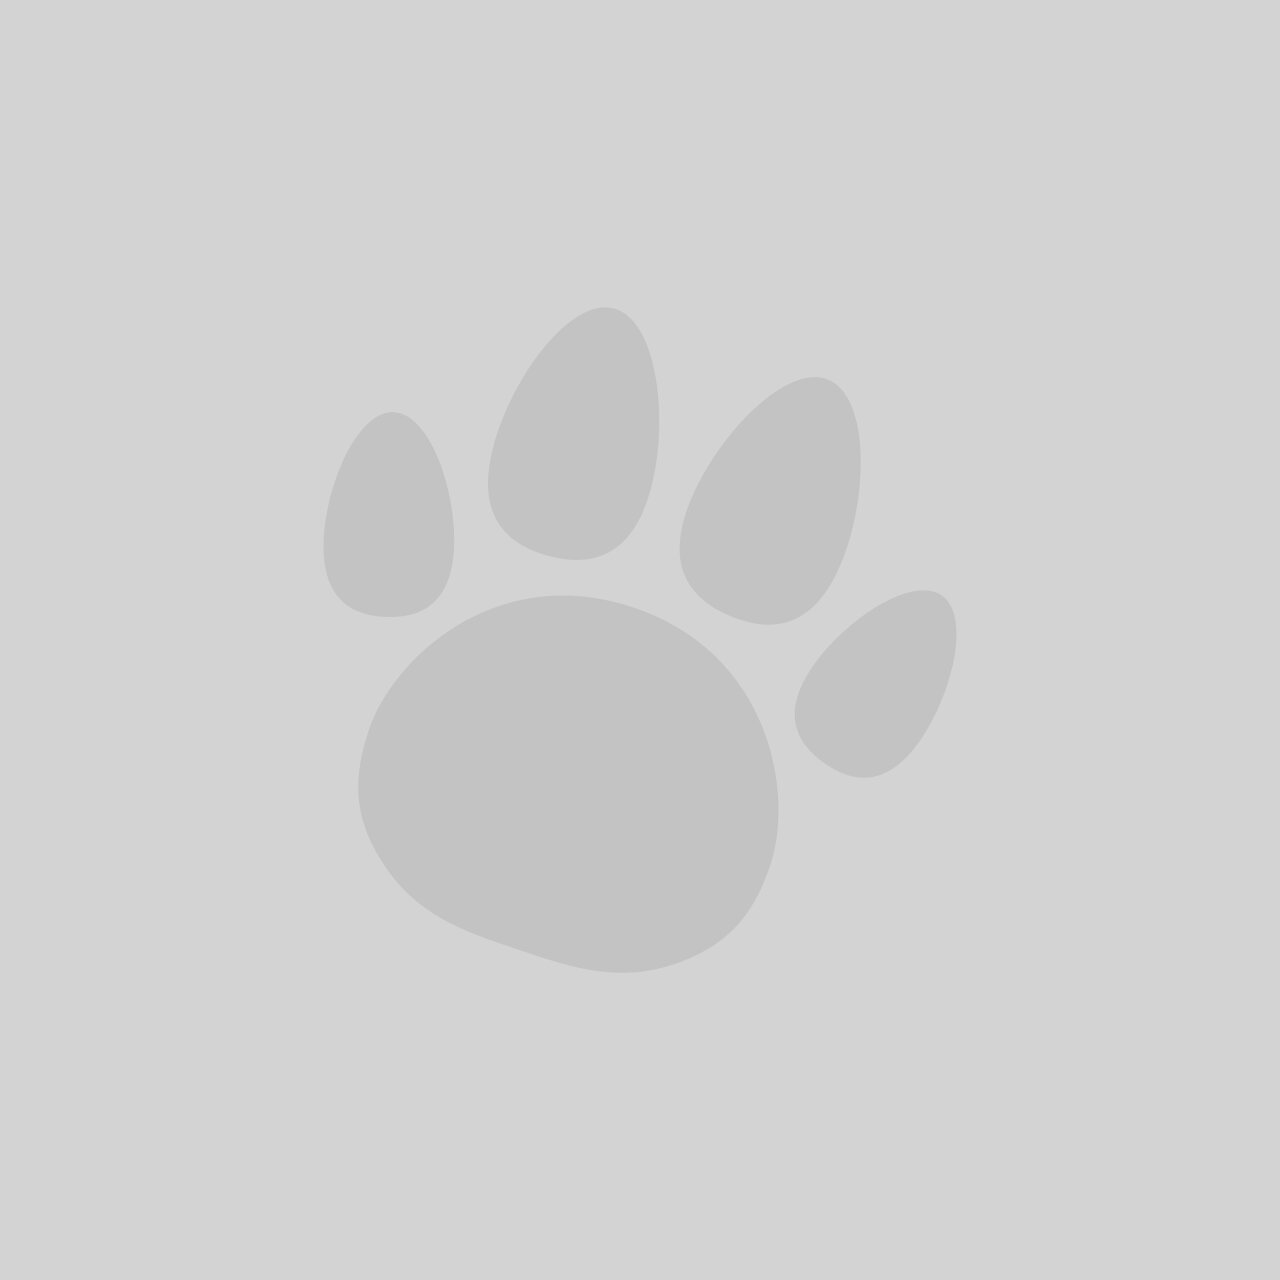 110c42017 Habitrail OVO Dwarf Hamster Habitat